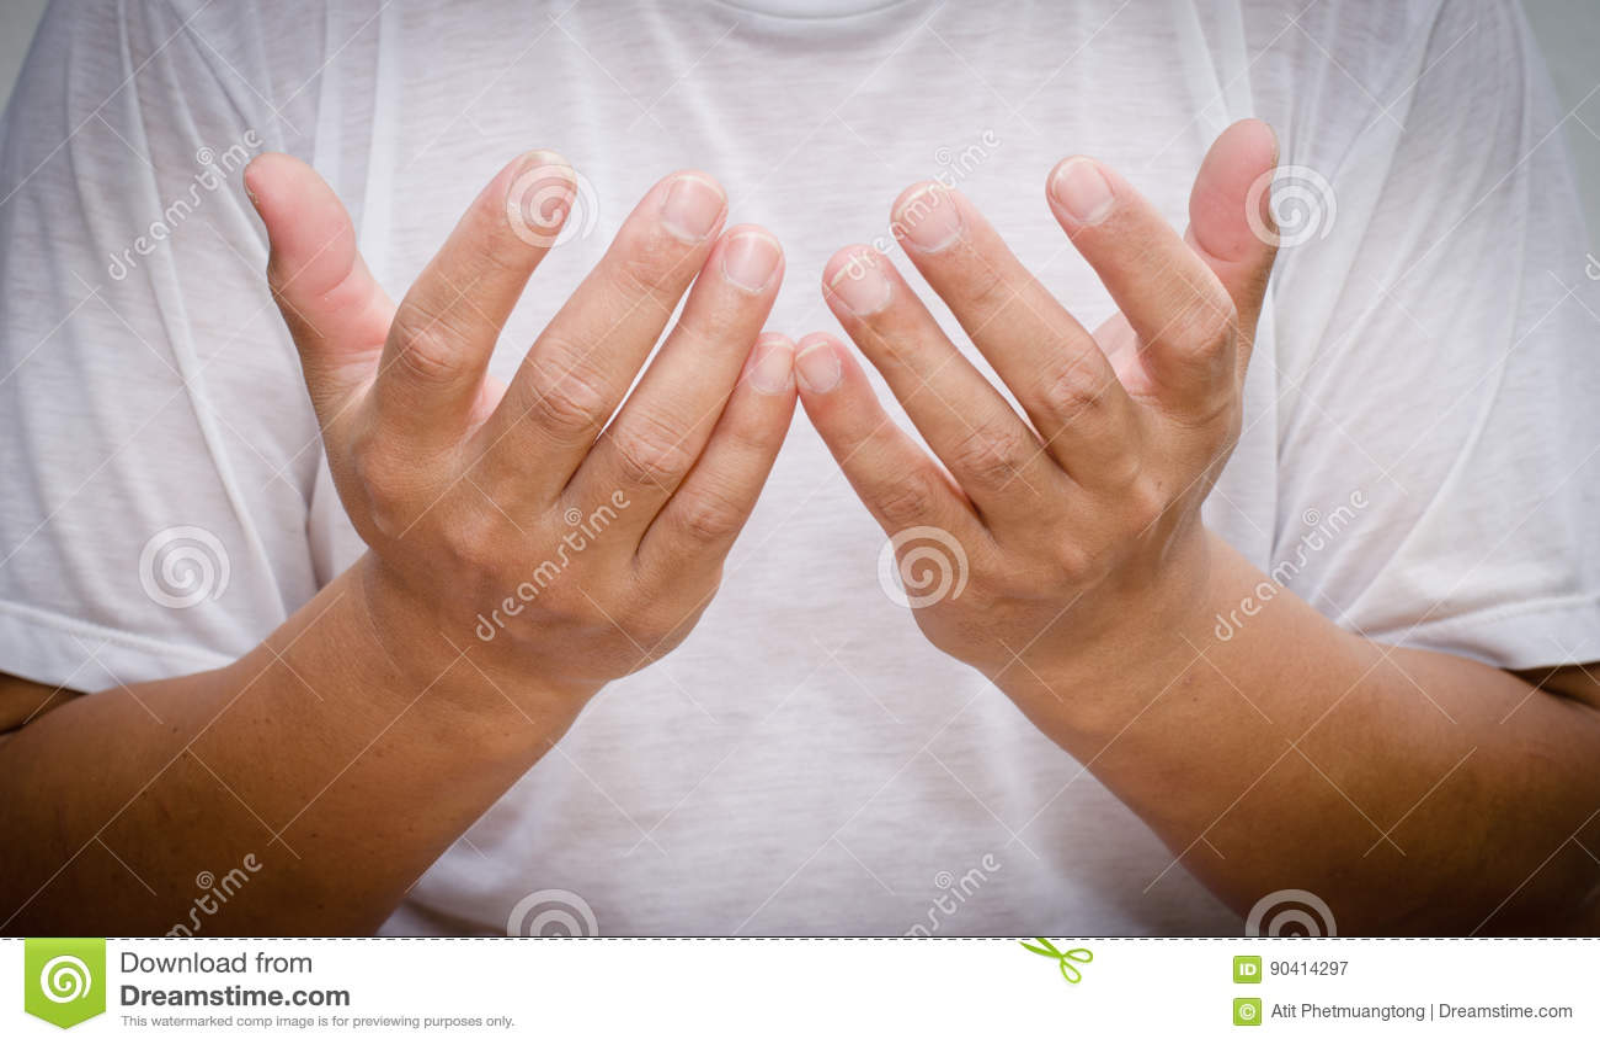 körpersprache des mannes